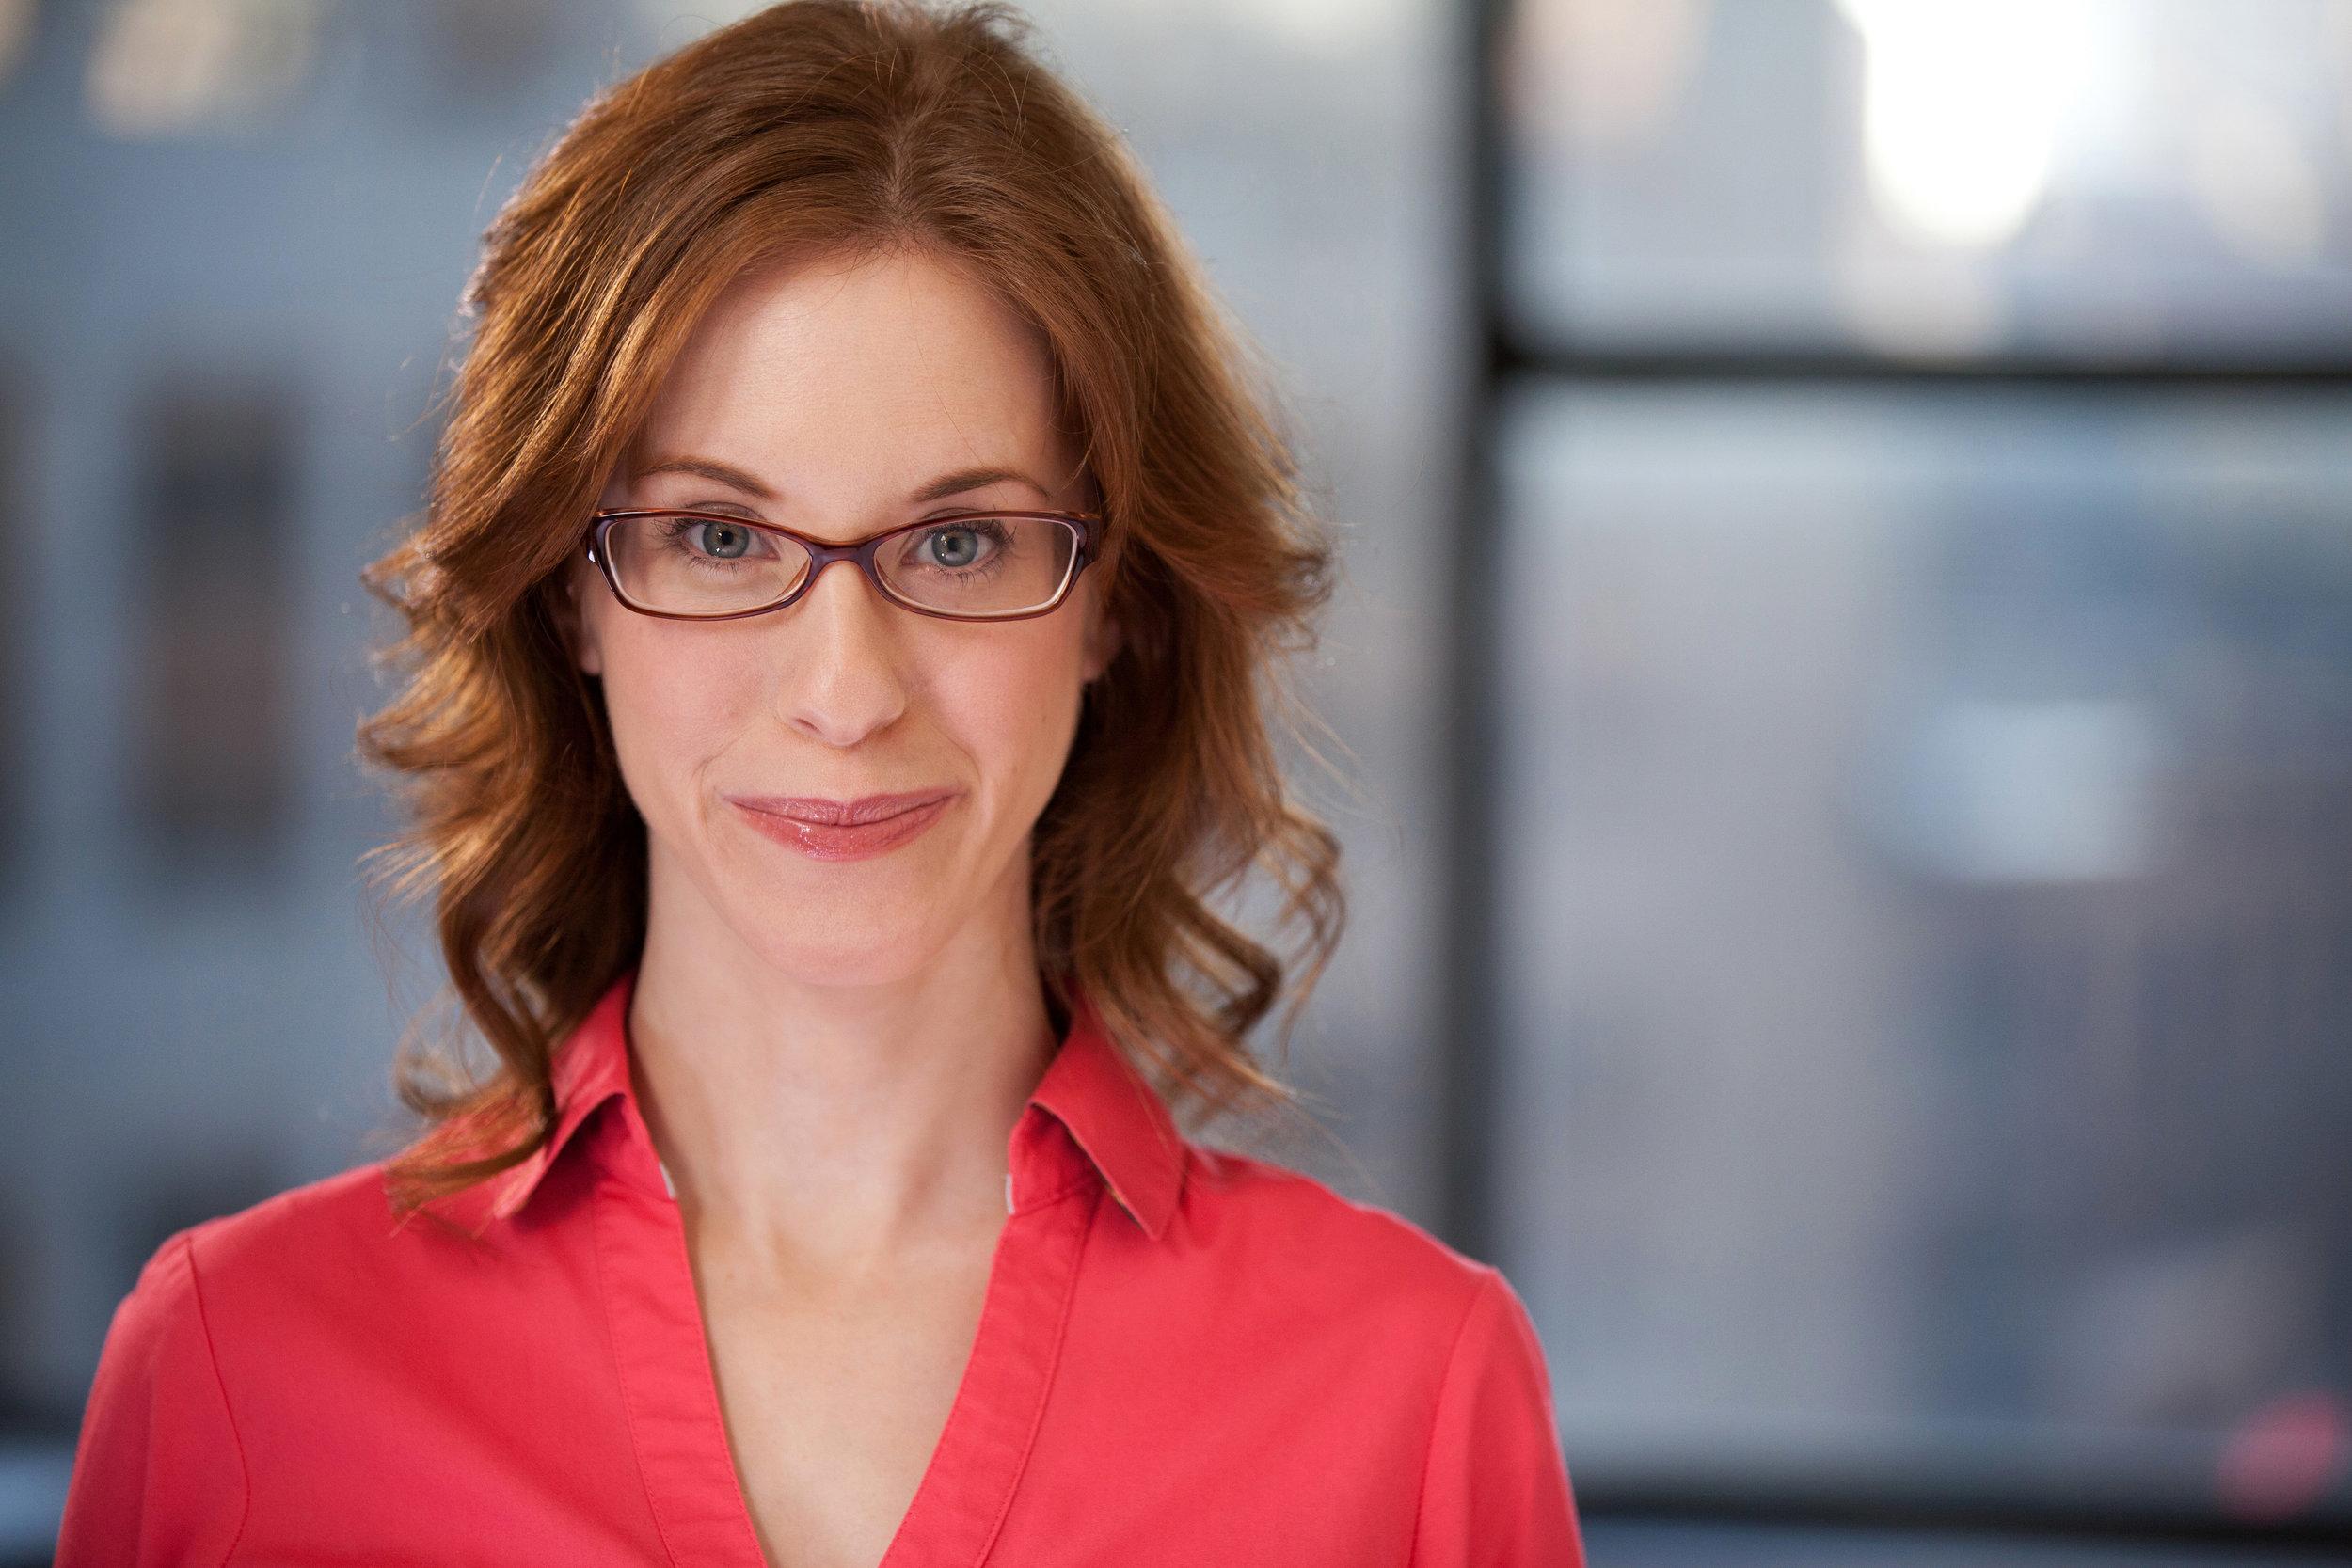 elisabeth-ness-glasses-headshot_13475820784_o.jpg